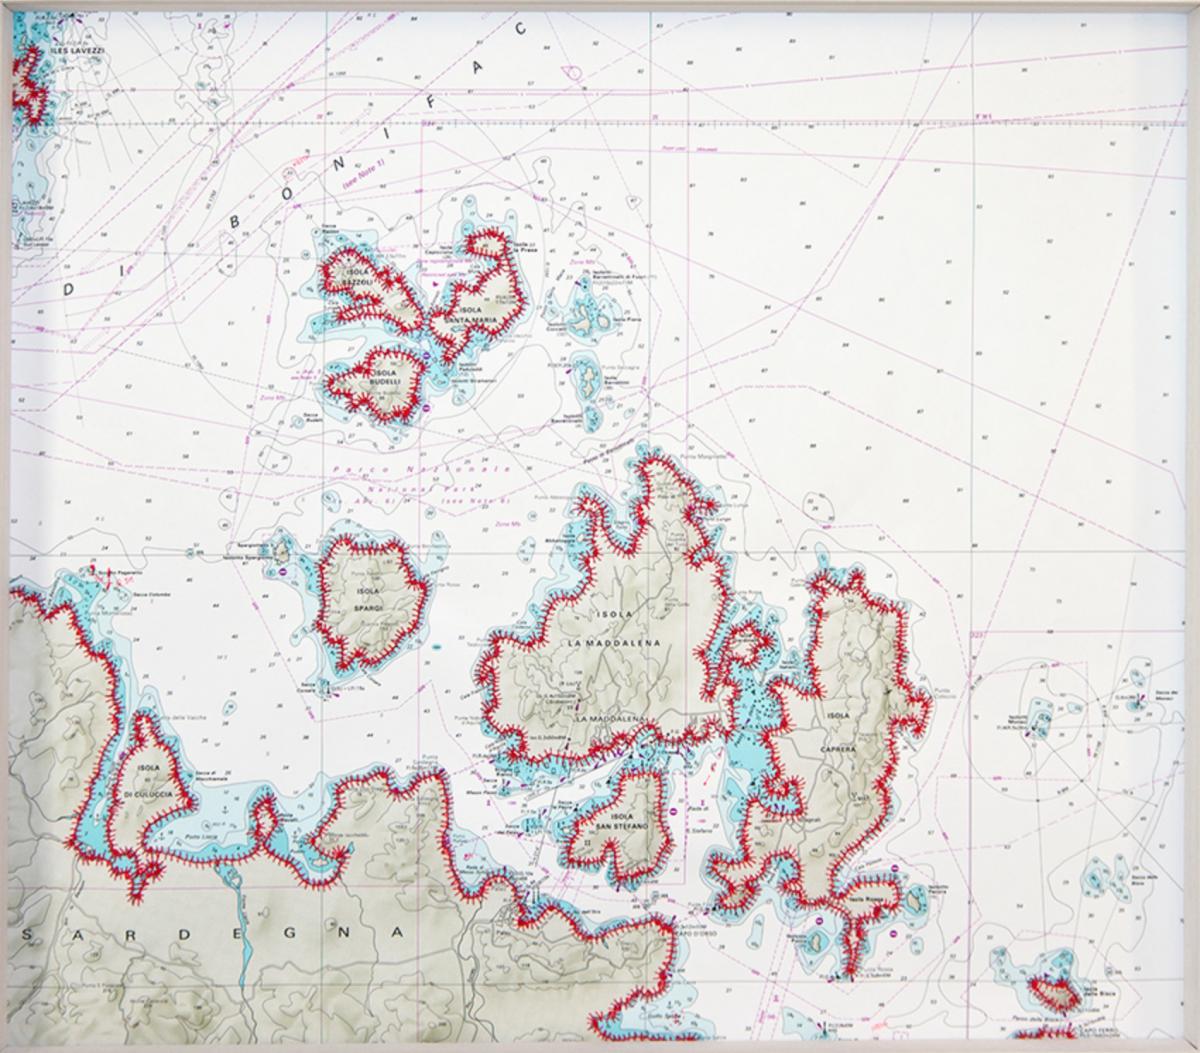 La Maddalena and its Archipelago